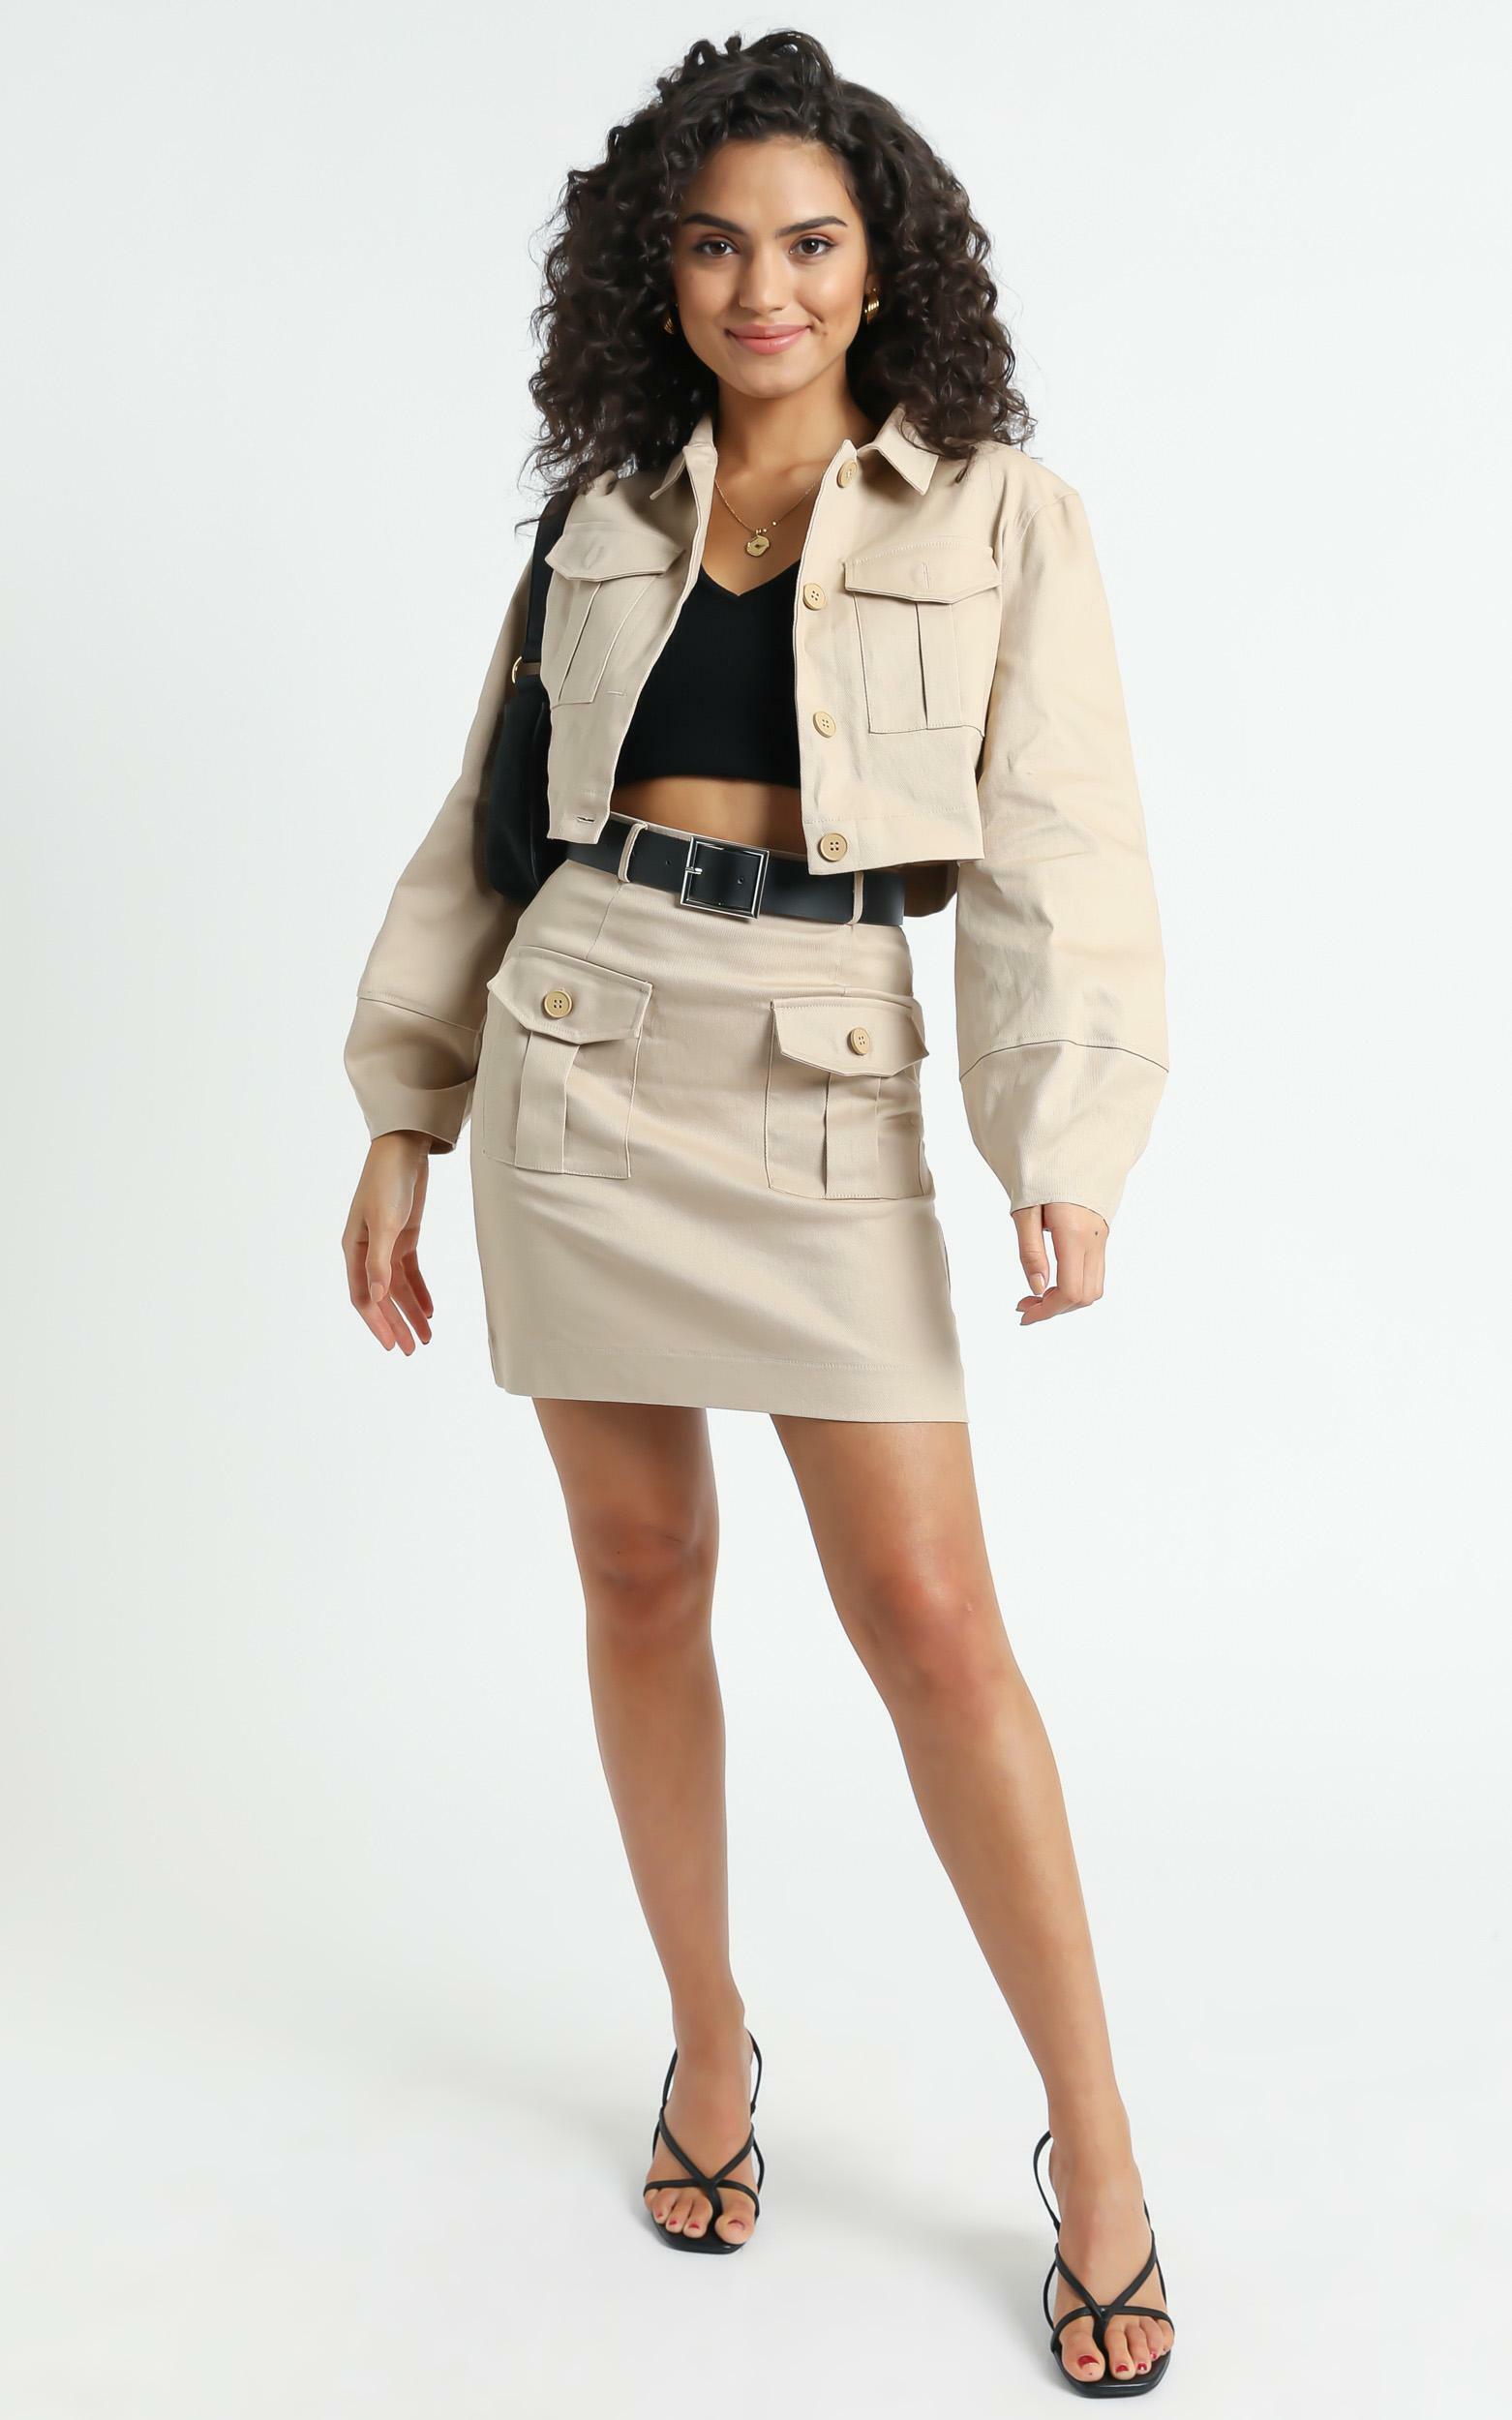 Armaras Skirt in Beige - 6 (XS), Beige, hi-res image number null